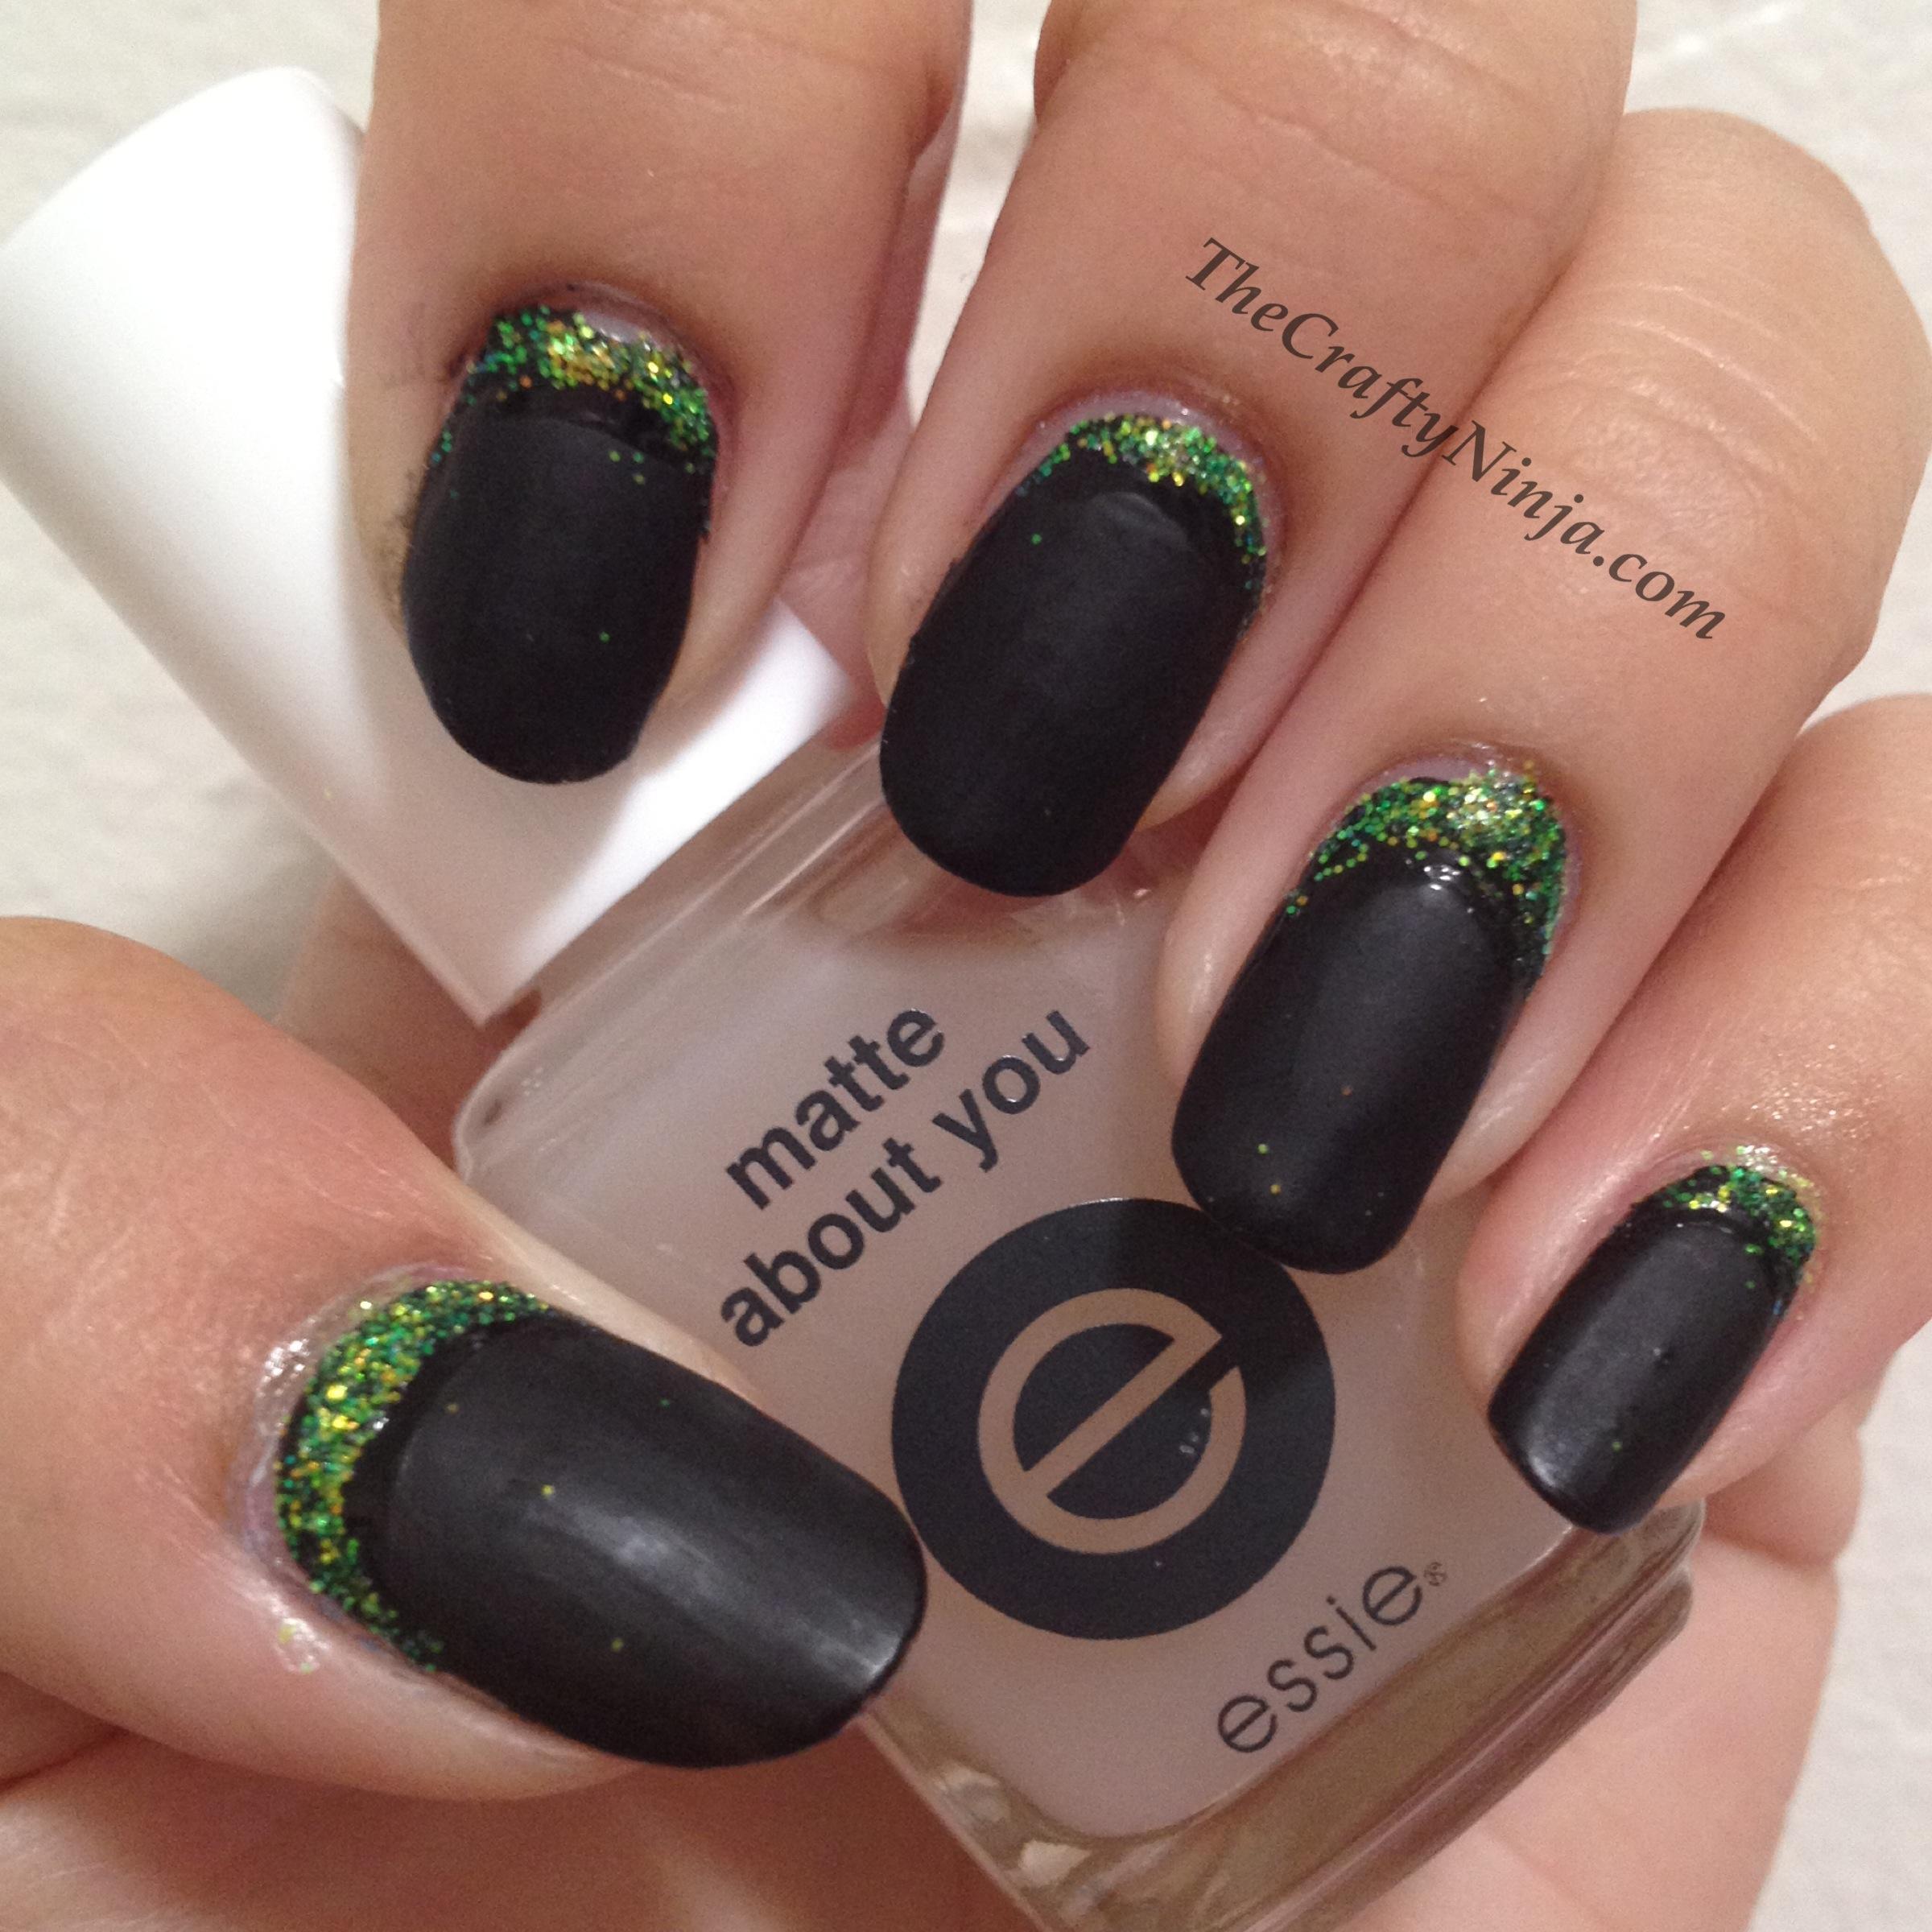 Ruffian Nails Tutorial | The Crafty Ninja